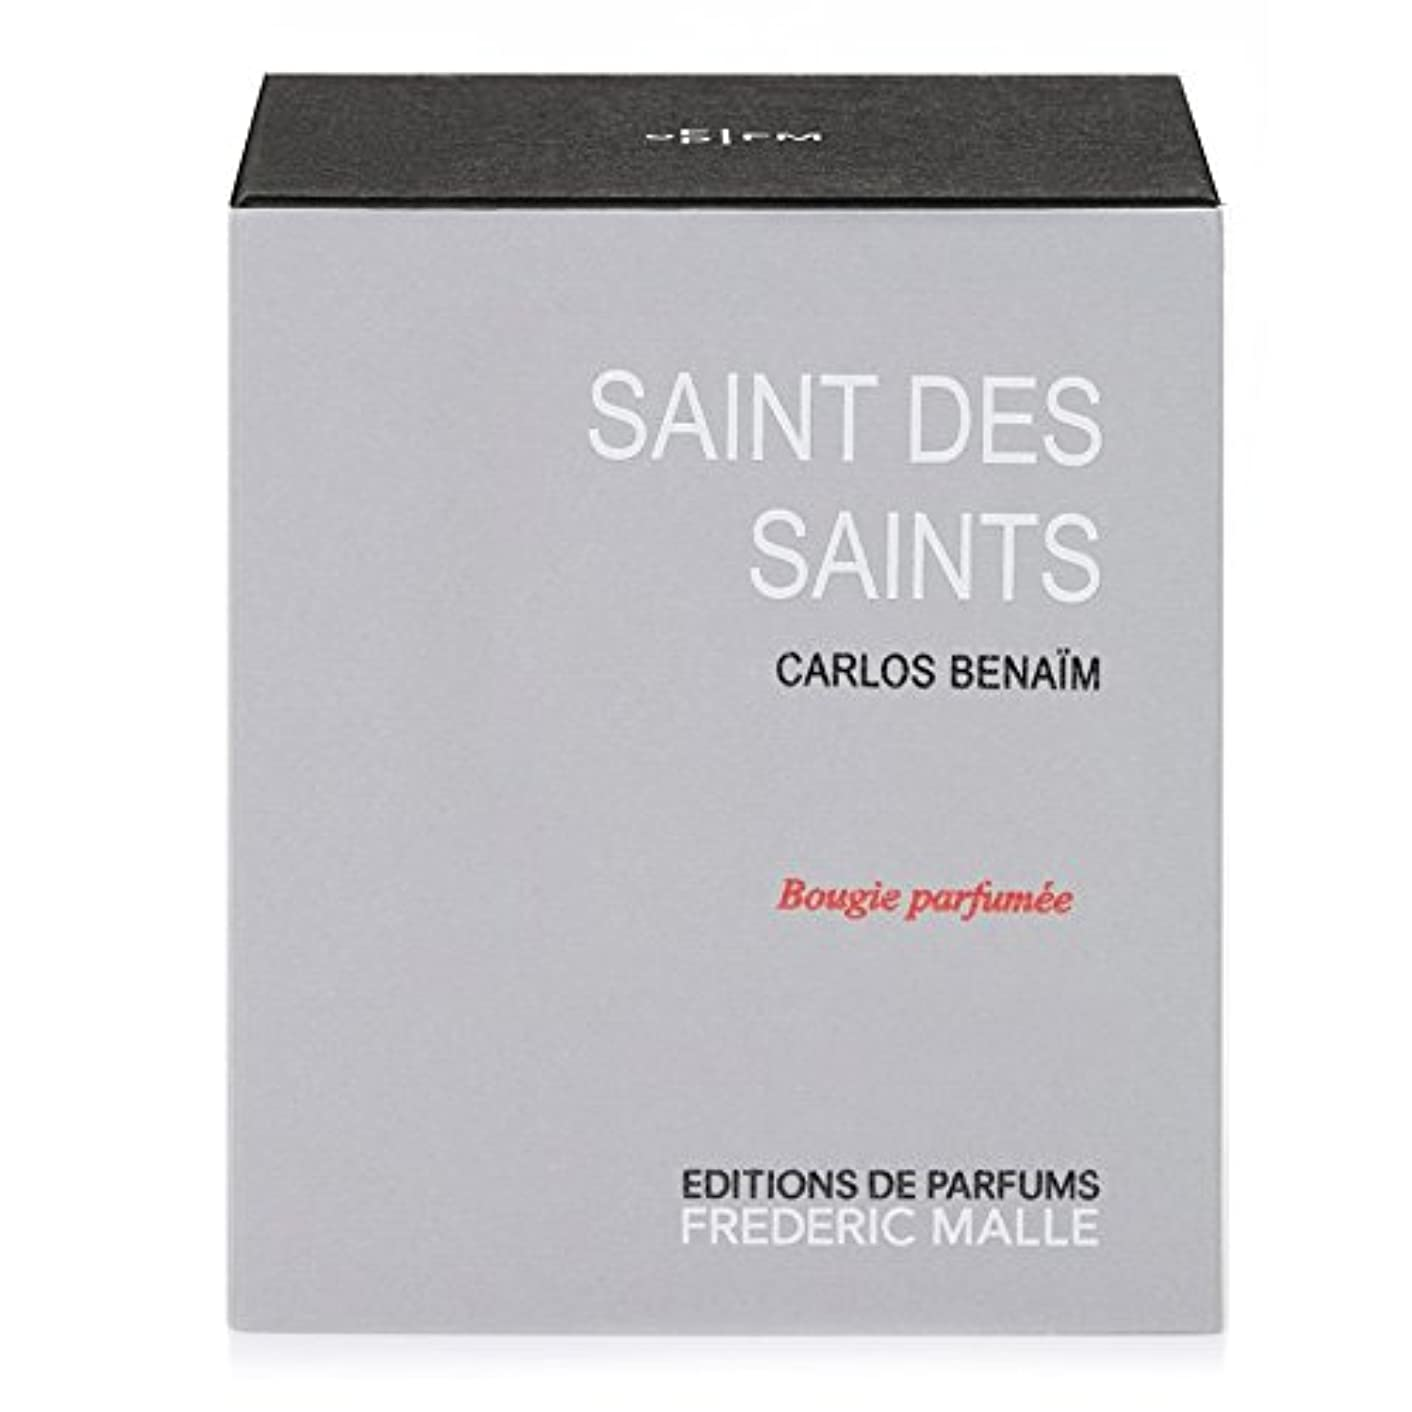 Frederic Malle Saint Des Saints Scented Candle 220g (Pack of 4) - フレデリック?マル聖人デ聖人の香りのキャンドル220グラム x4 [並行輸入品]